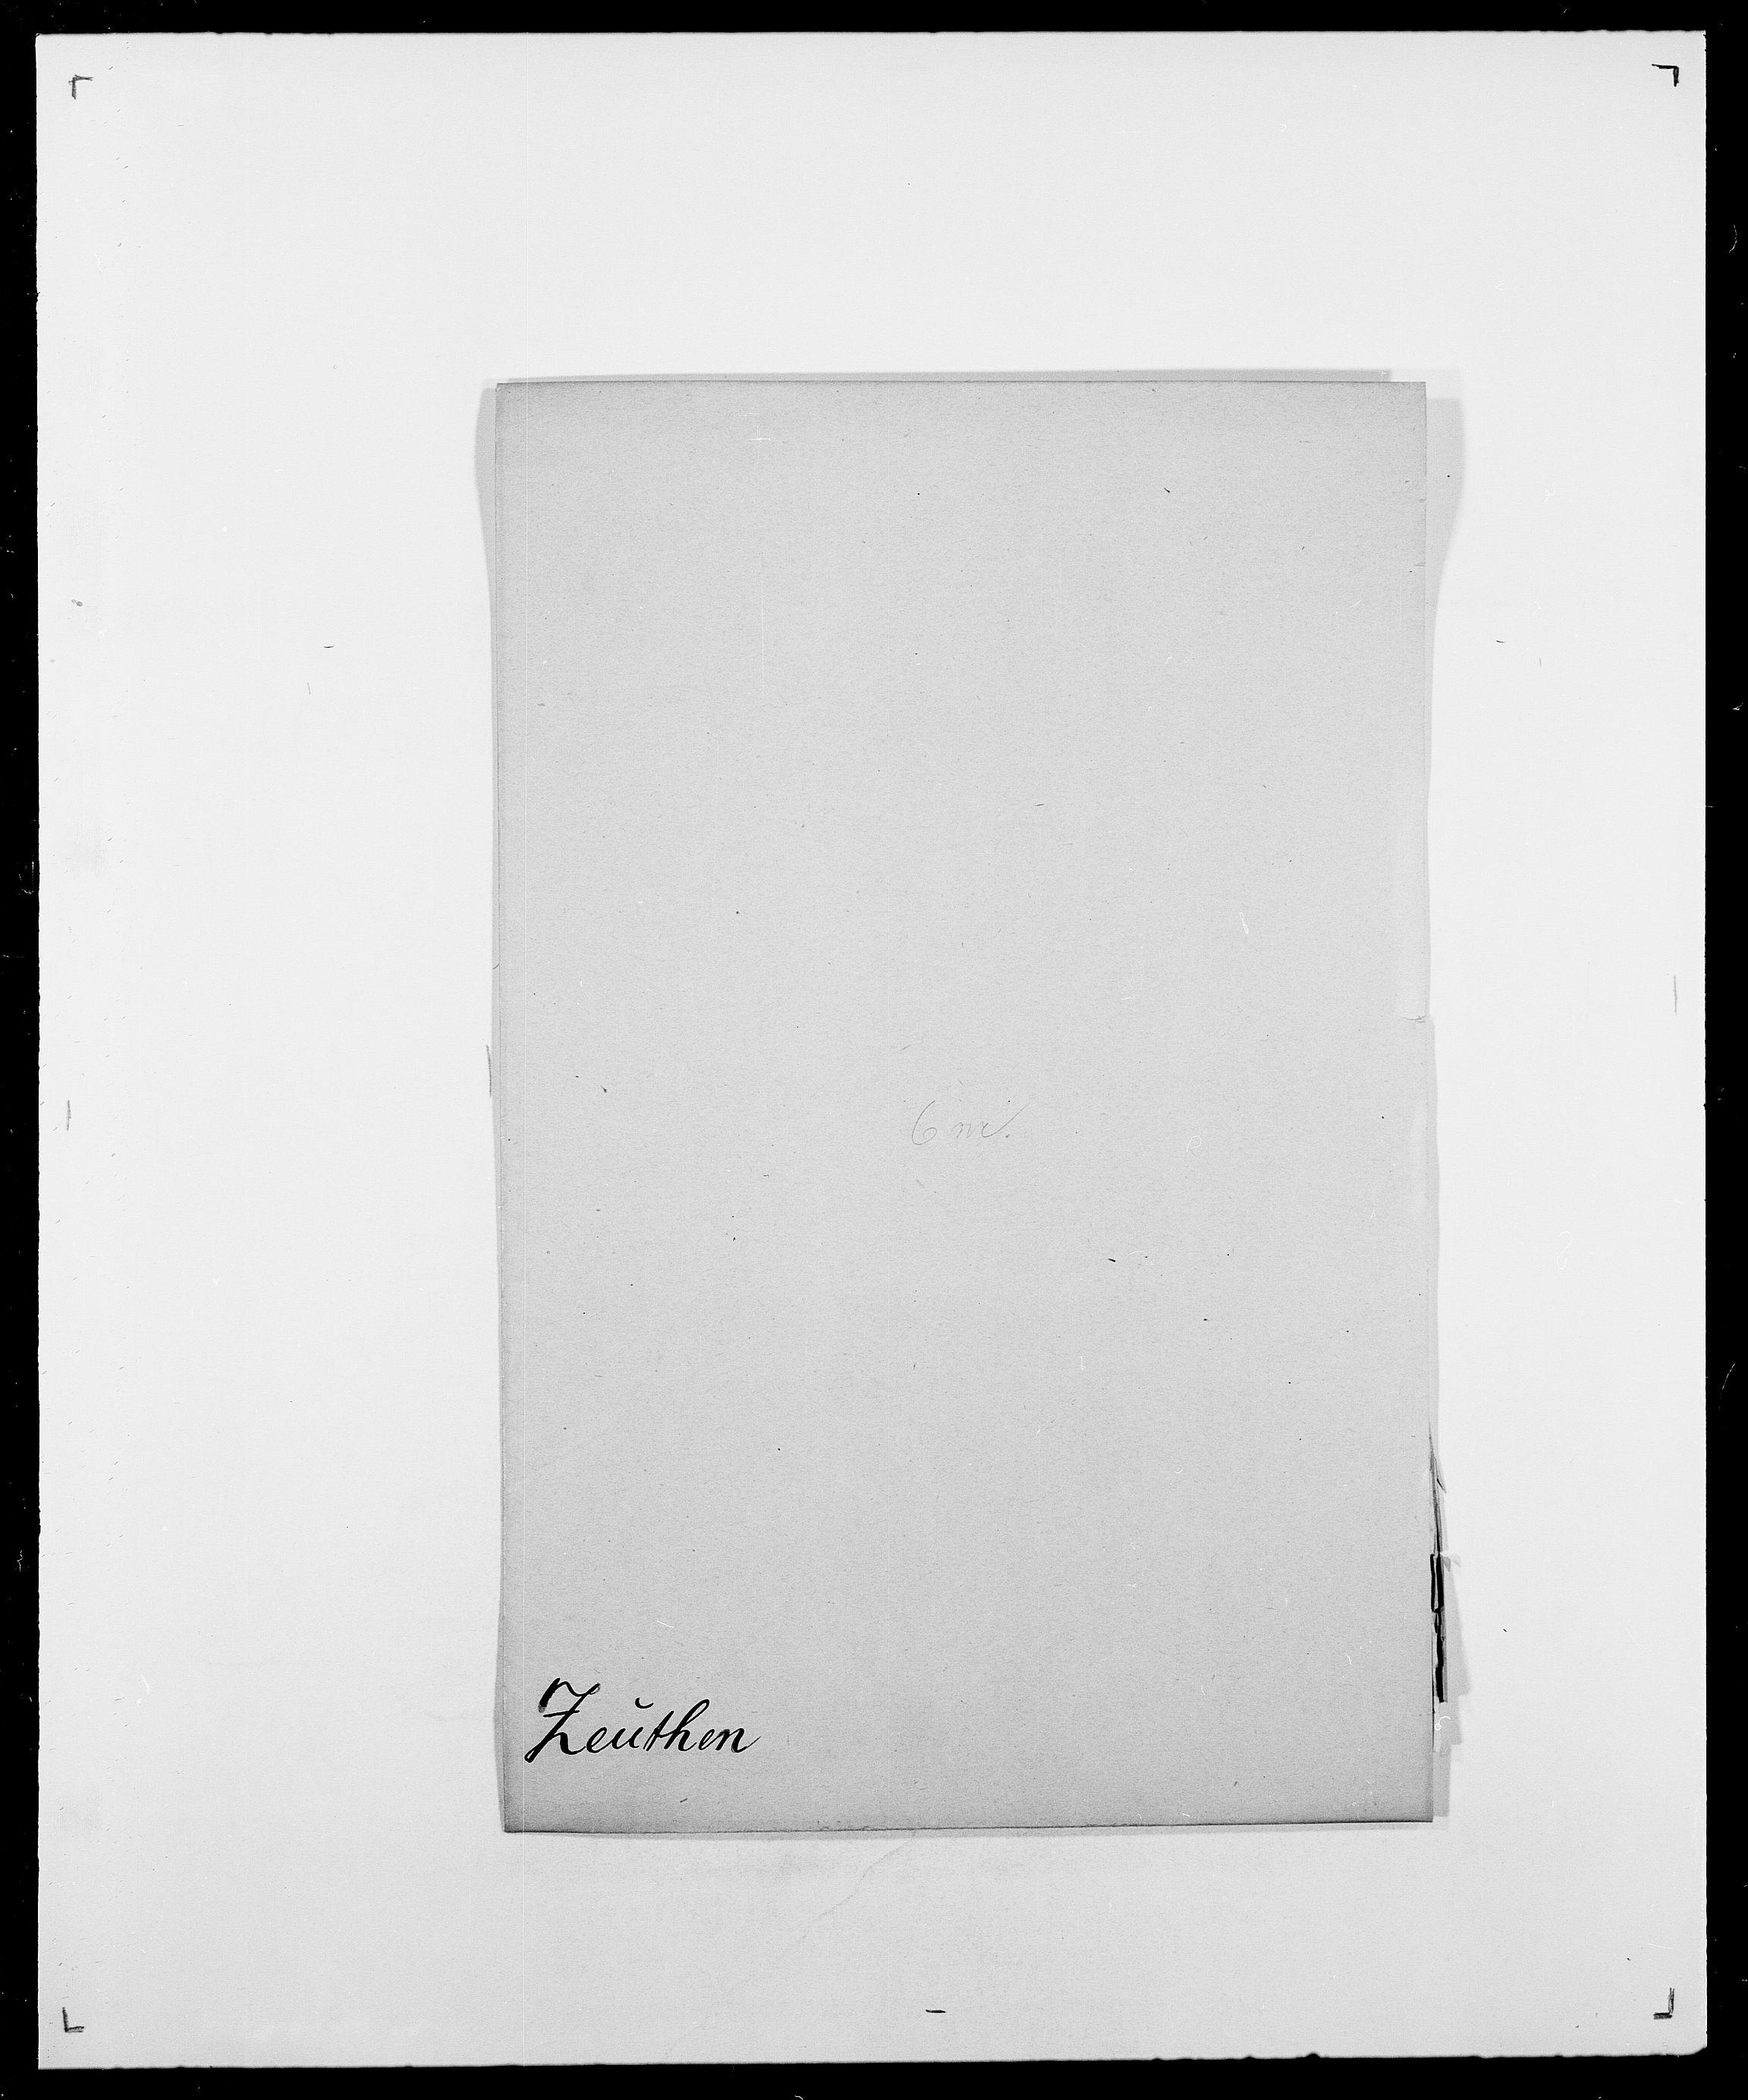 SAO, Delgobe, Charles Antoine - samling, D/Da/L0043: Wulfsberg - v. Zanten, s. 111